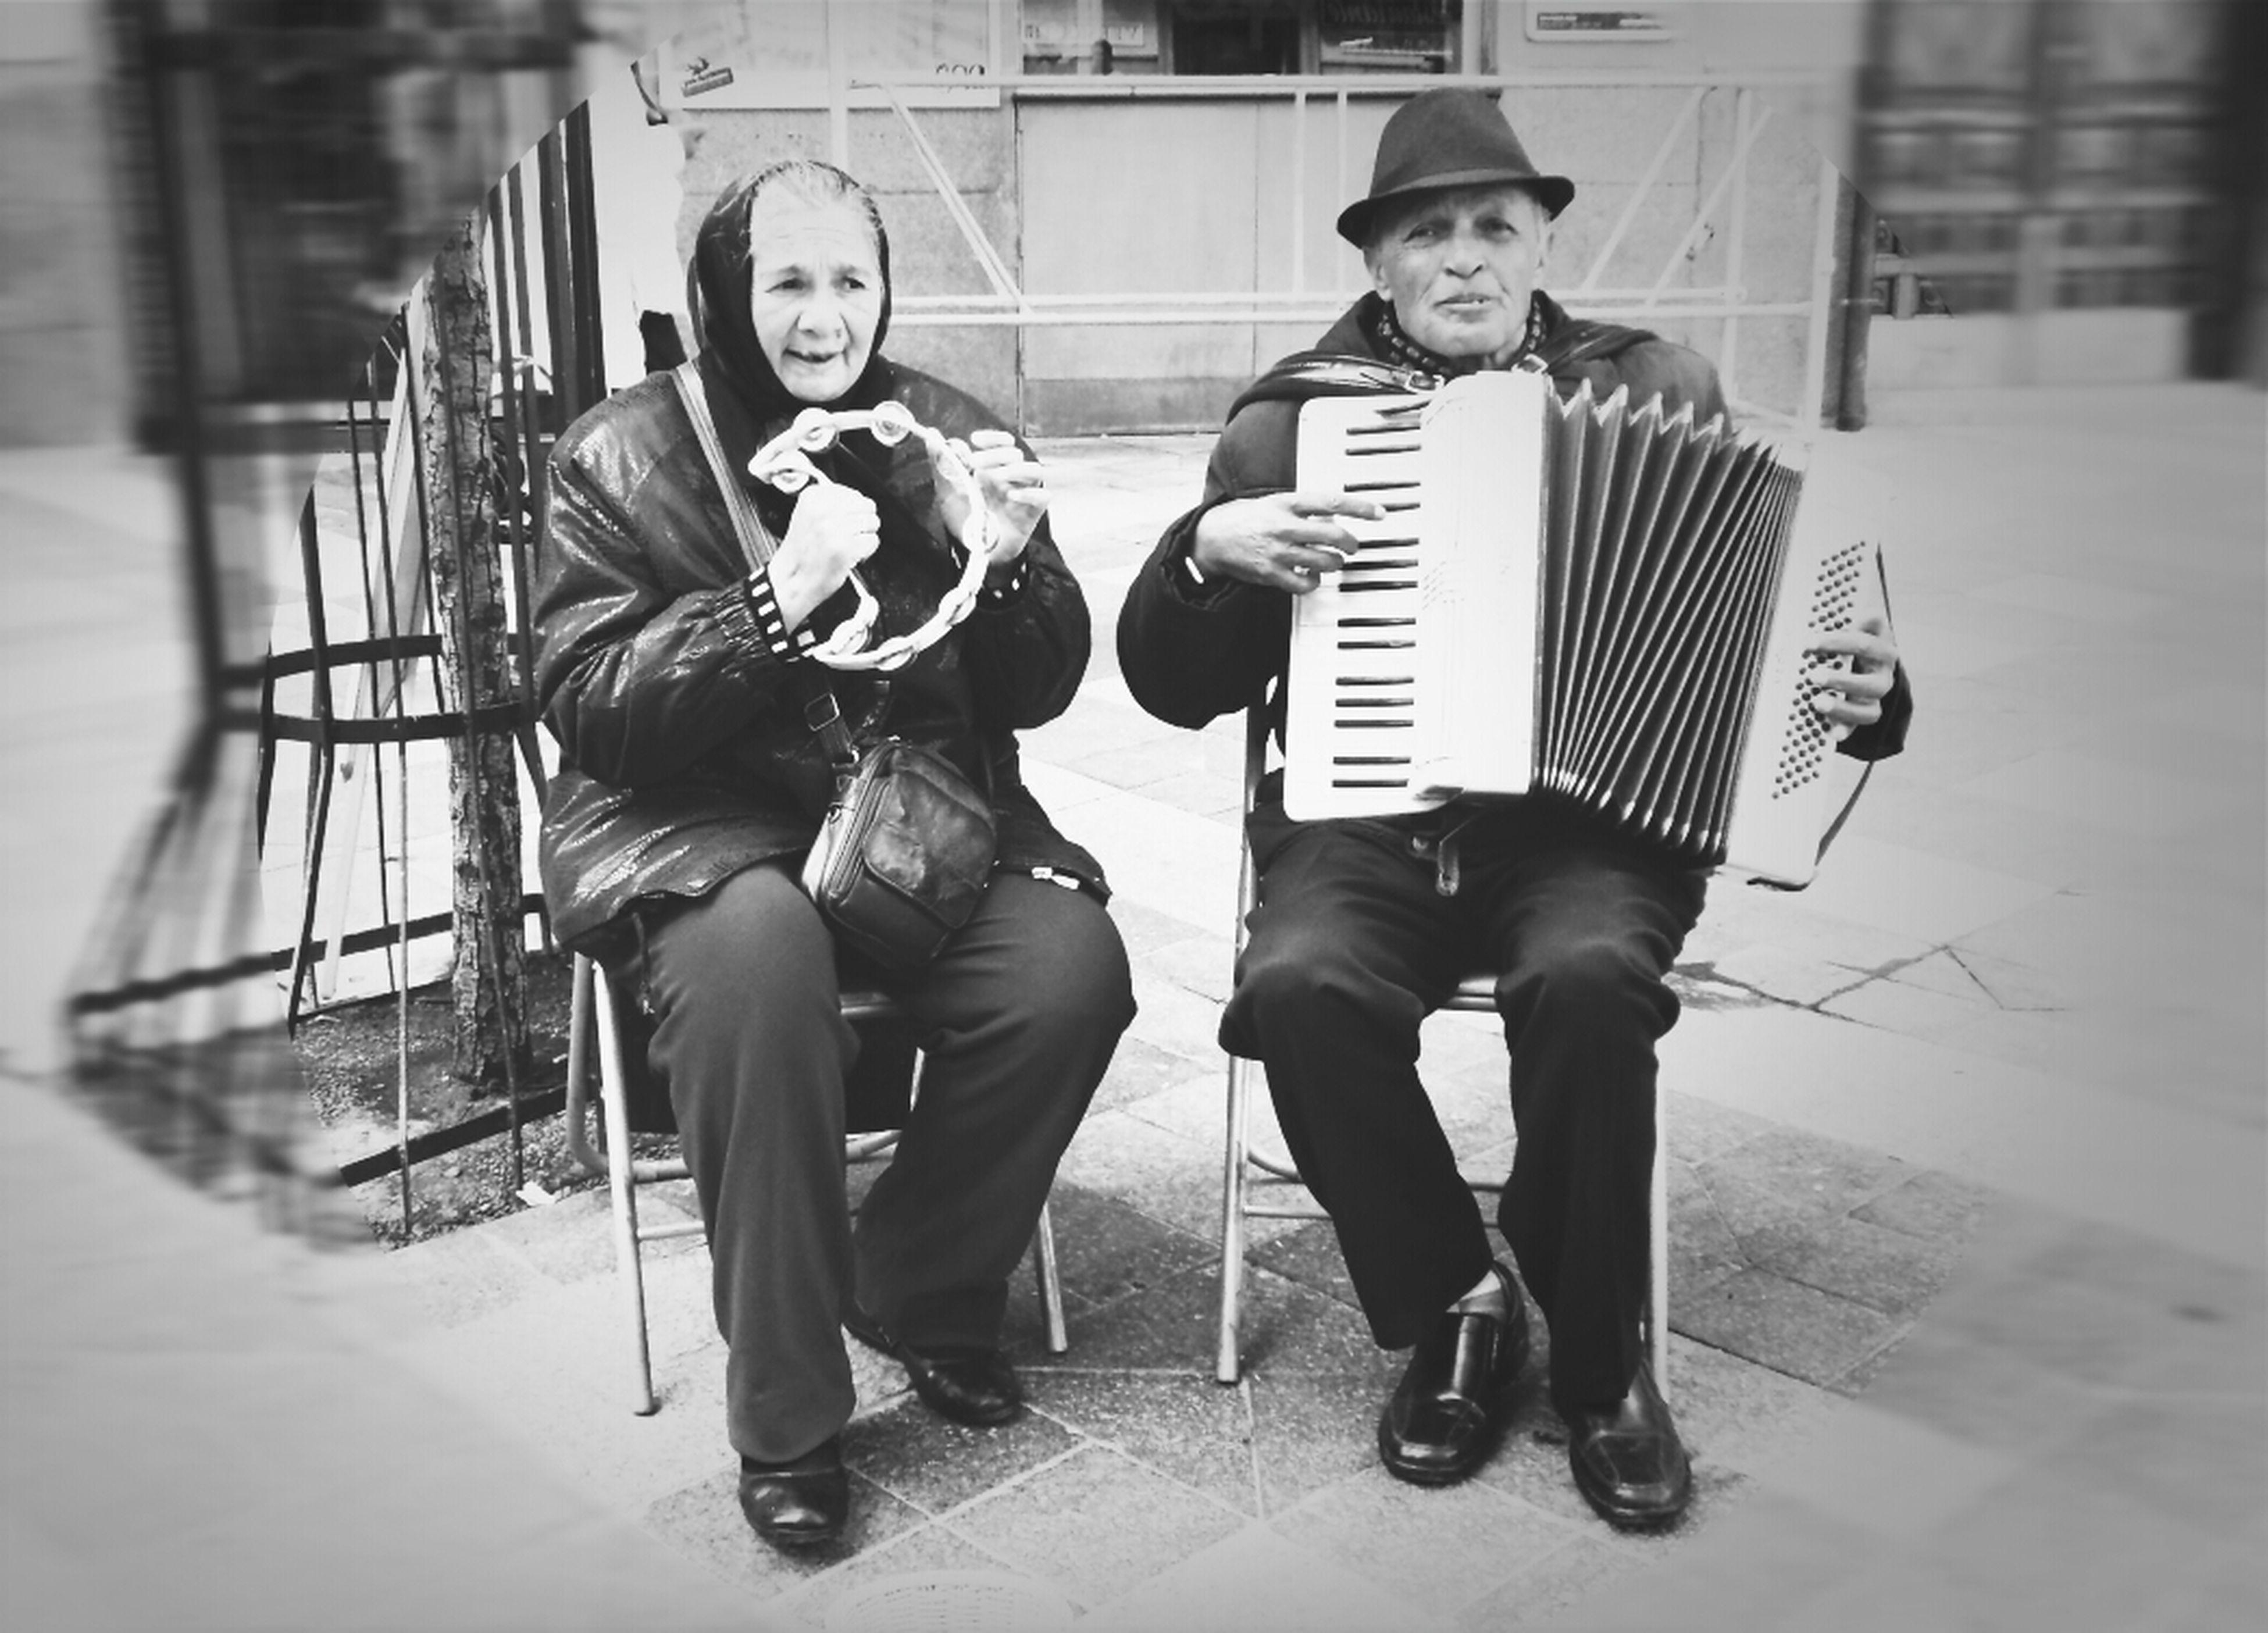 Blackandwhite Street Musicians EyeEm Best Shots - People + Portrait Blackandwite Blancoynegro Love Without Boundaries